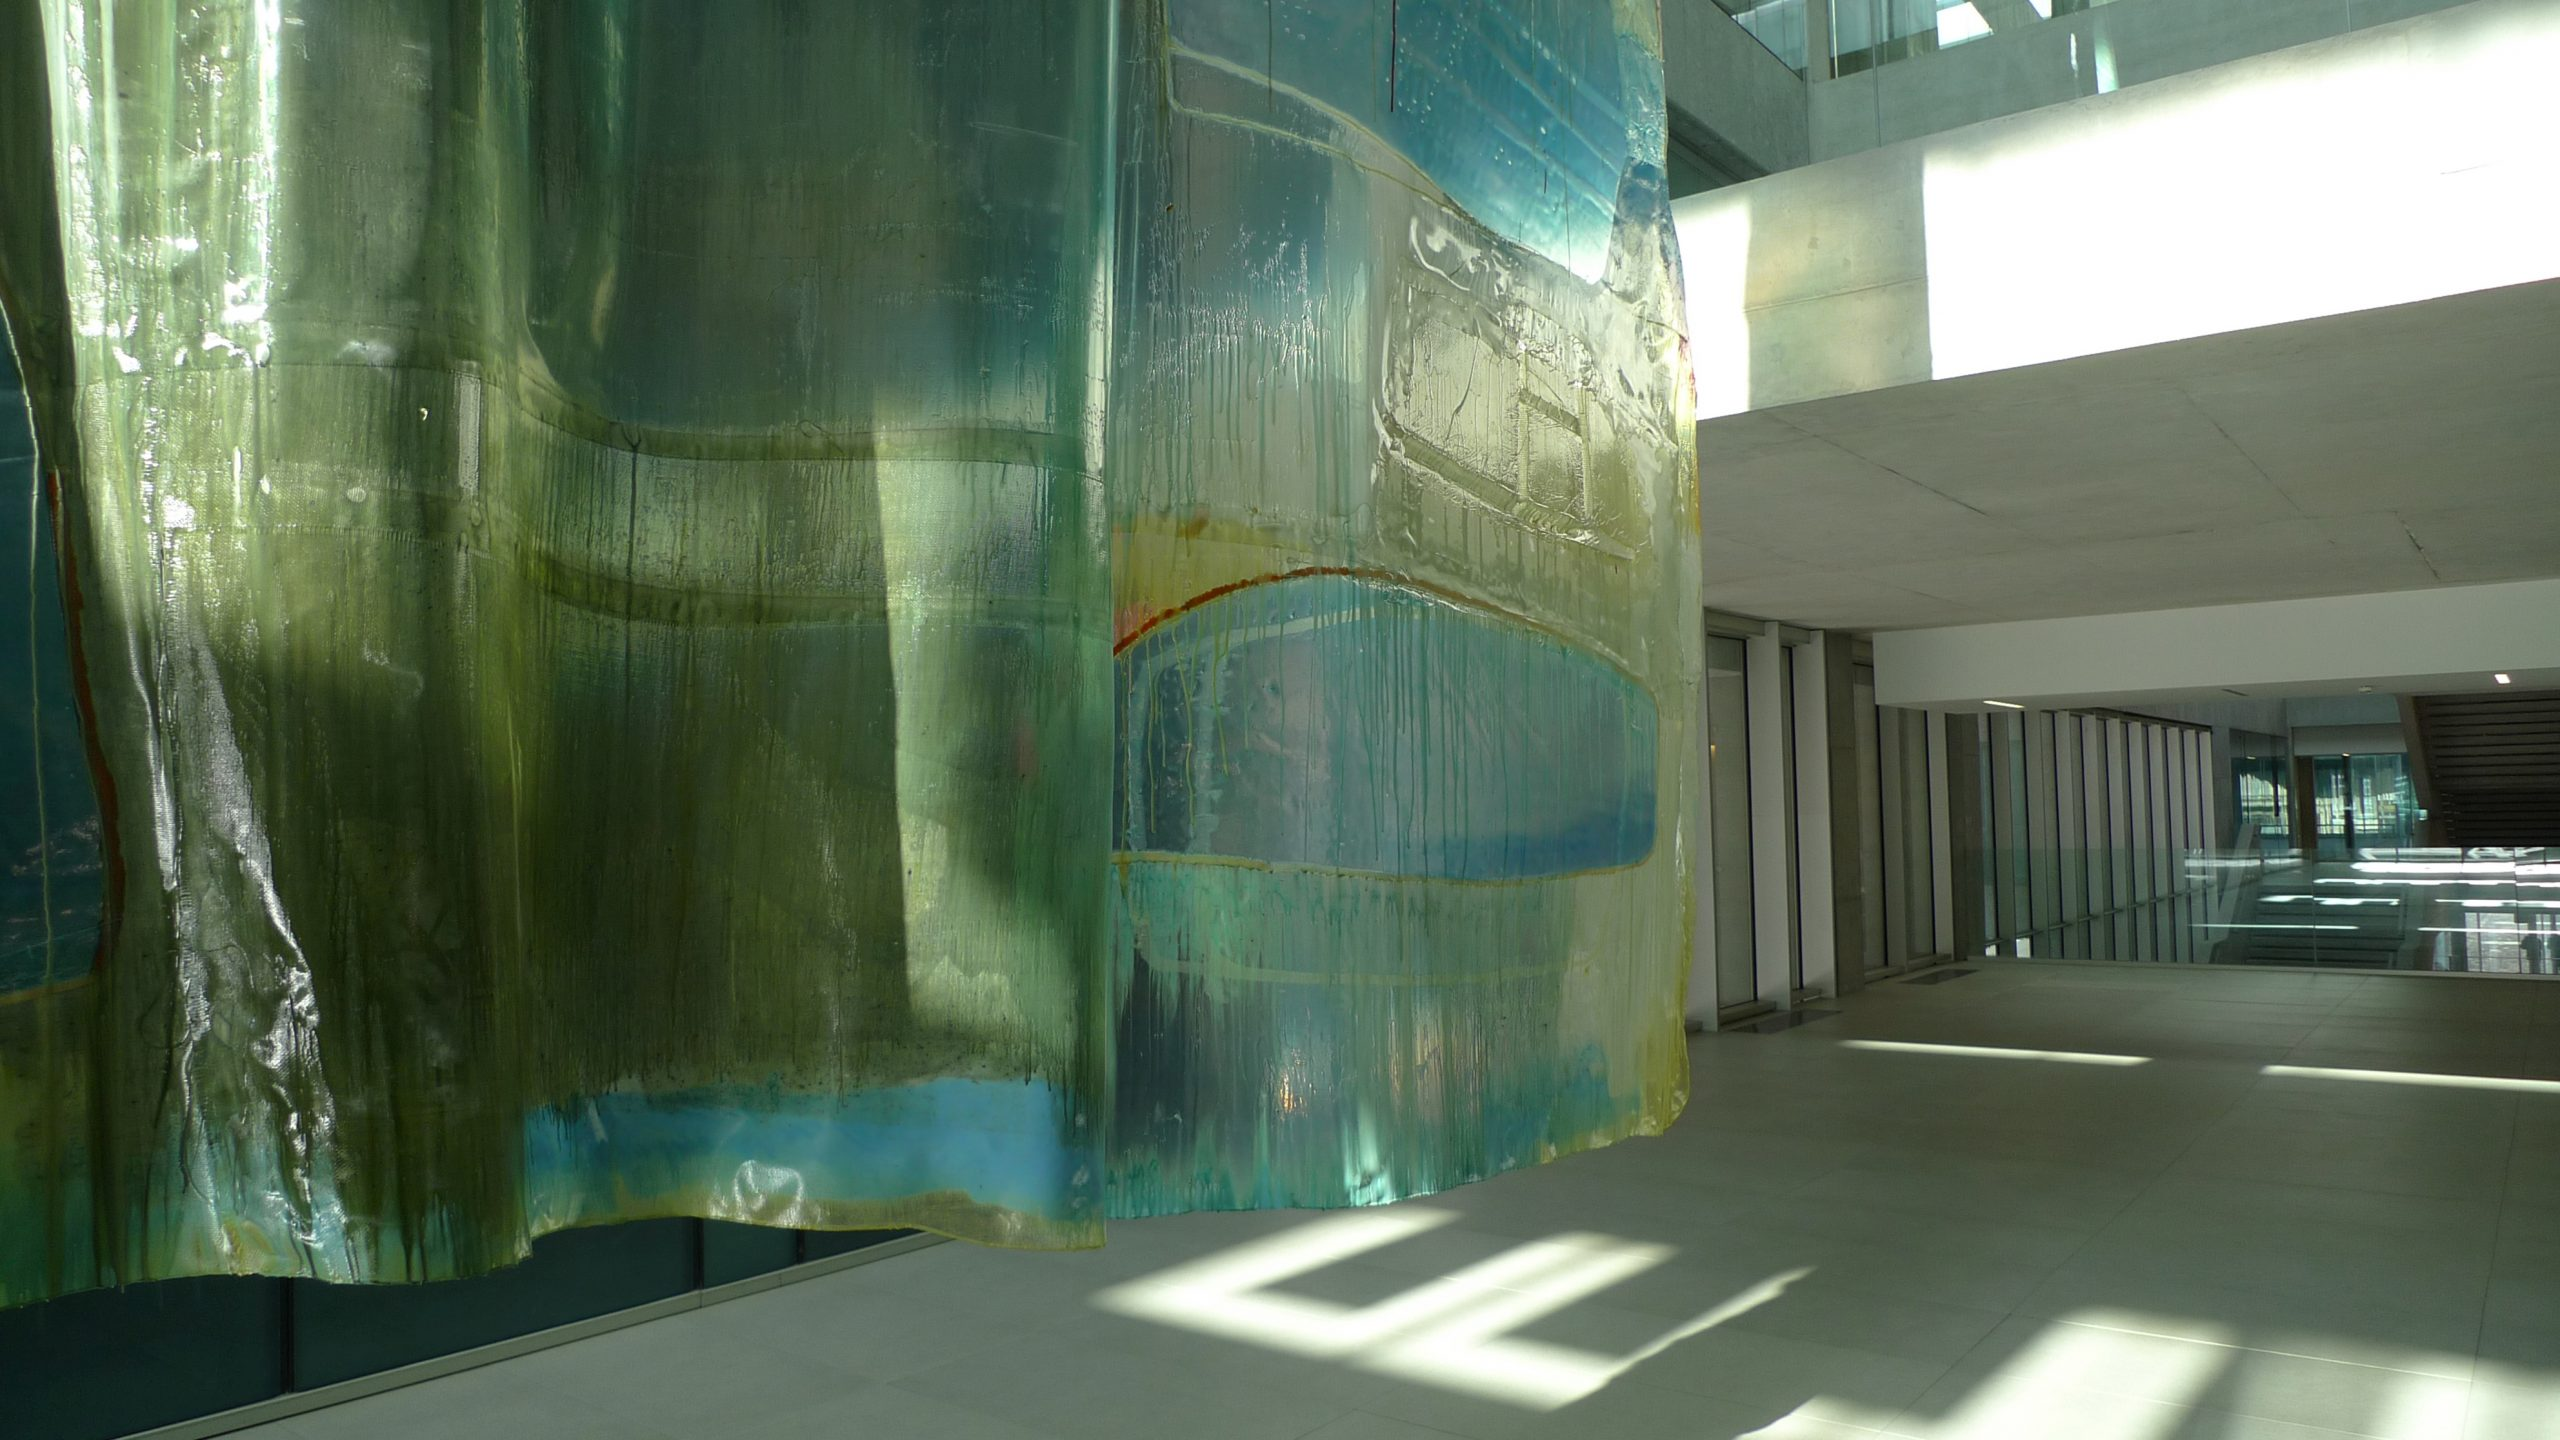 Boconni University Gallery, Milan Italy courtesy LUMC Kunstzaken, Netherlands